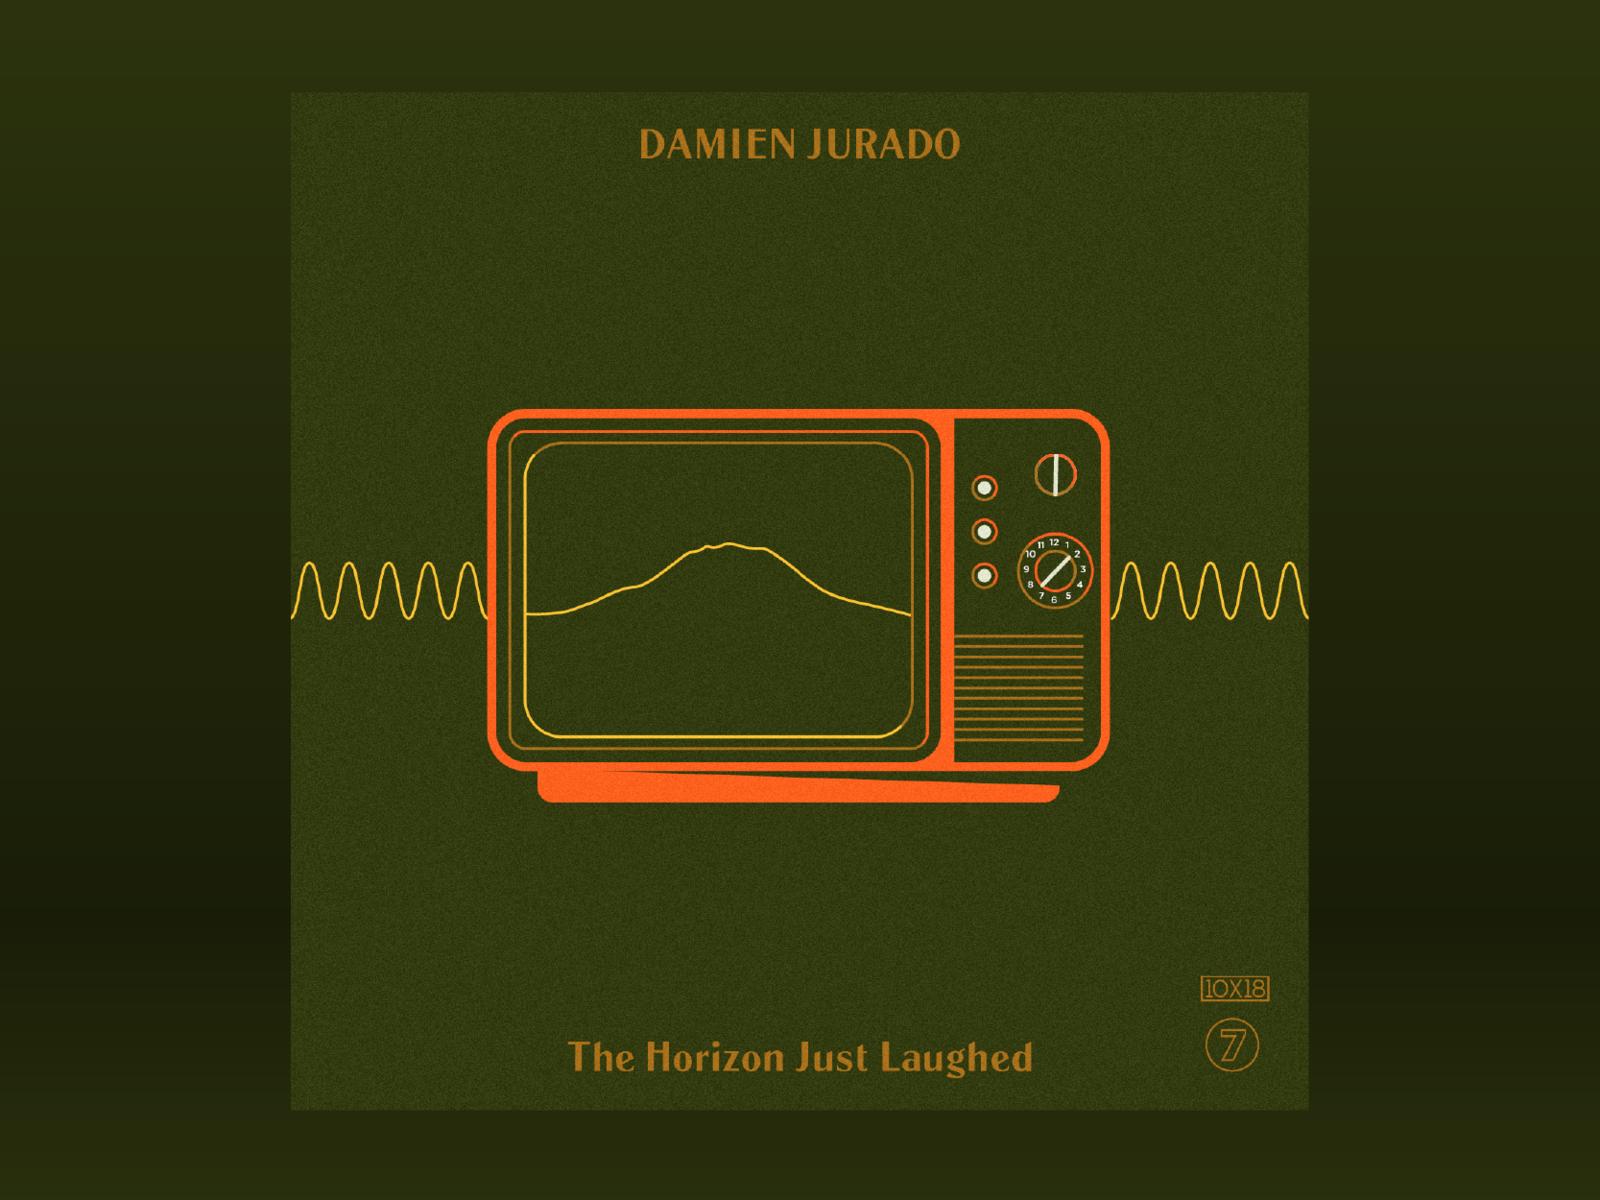 10x18: #7 Damien Jurado - The Horizon Just Laughed album vintage retro tv sound waves mt rainier 10x18